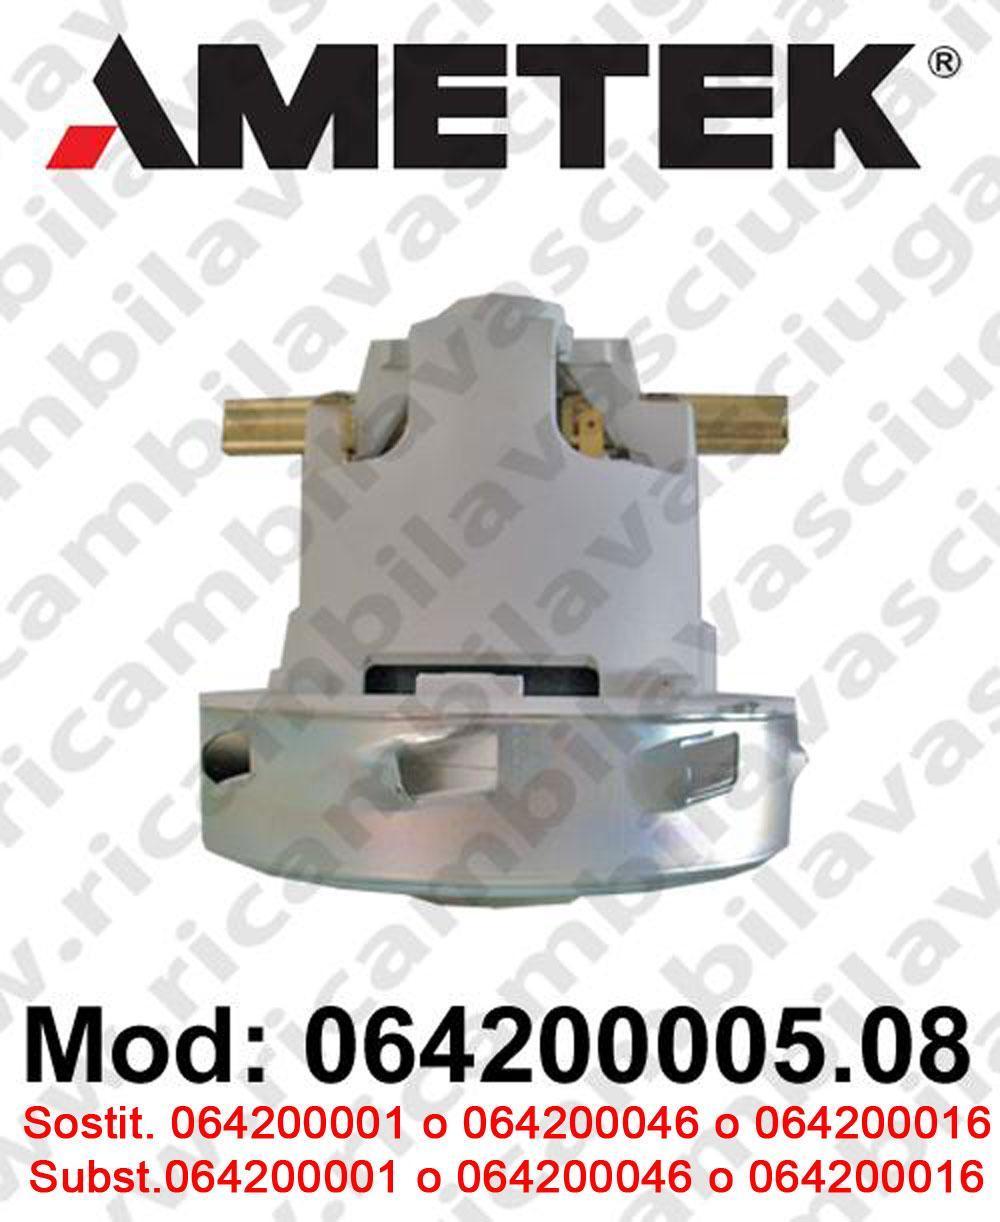 Vacuum motor 064200005.08 AMETEK ITALIA for scrubber dryer and vacuum cleaner. Replace 064200001 or 064200016 or 064200046